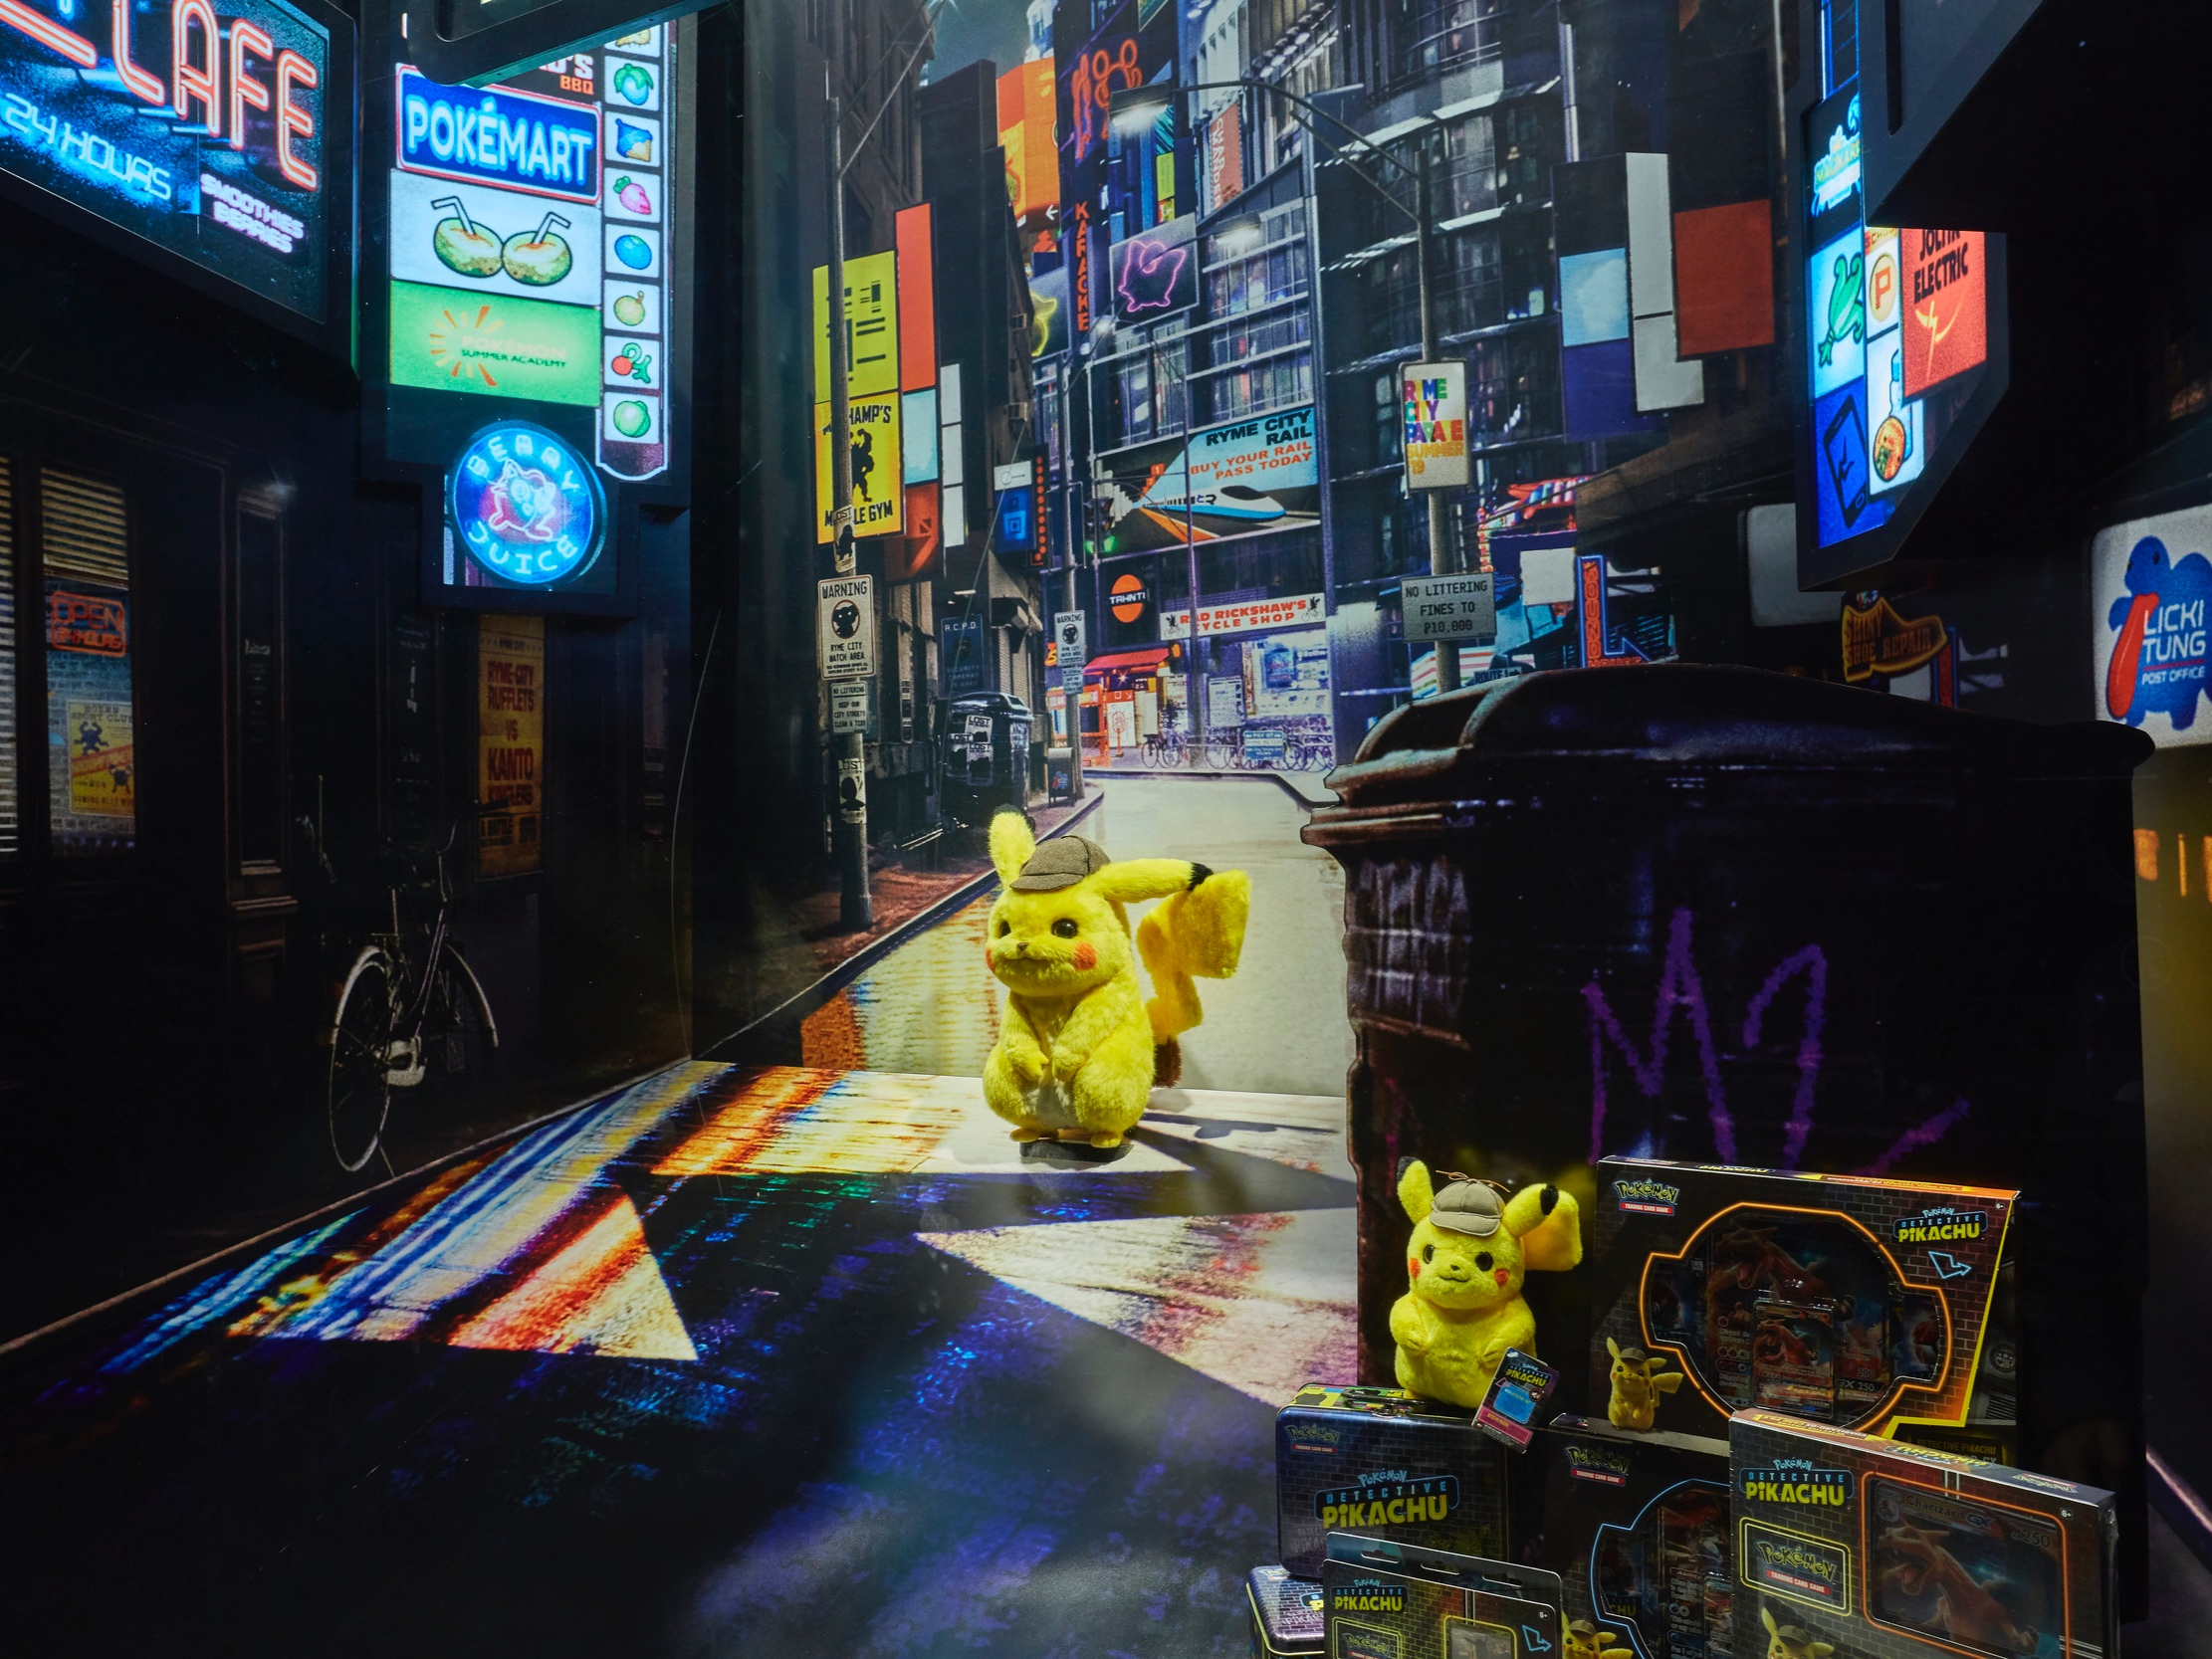 Pokemon+Pikachu+Detective%2C+Propability%2C+Hamleys+.jpg